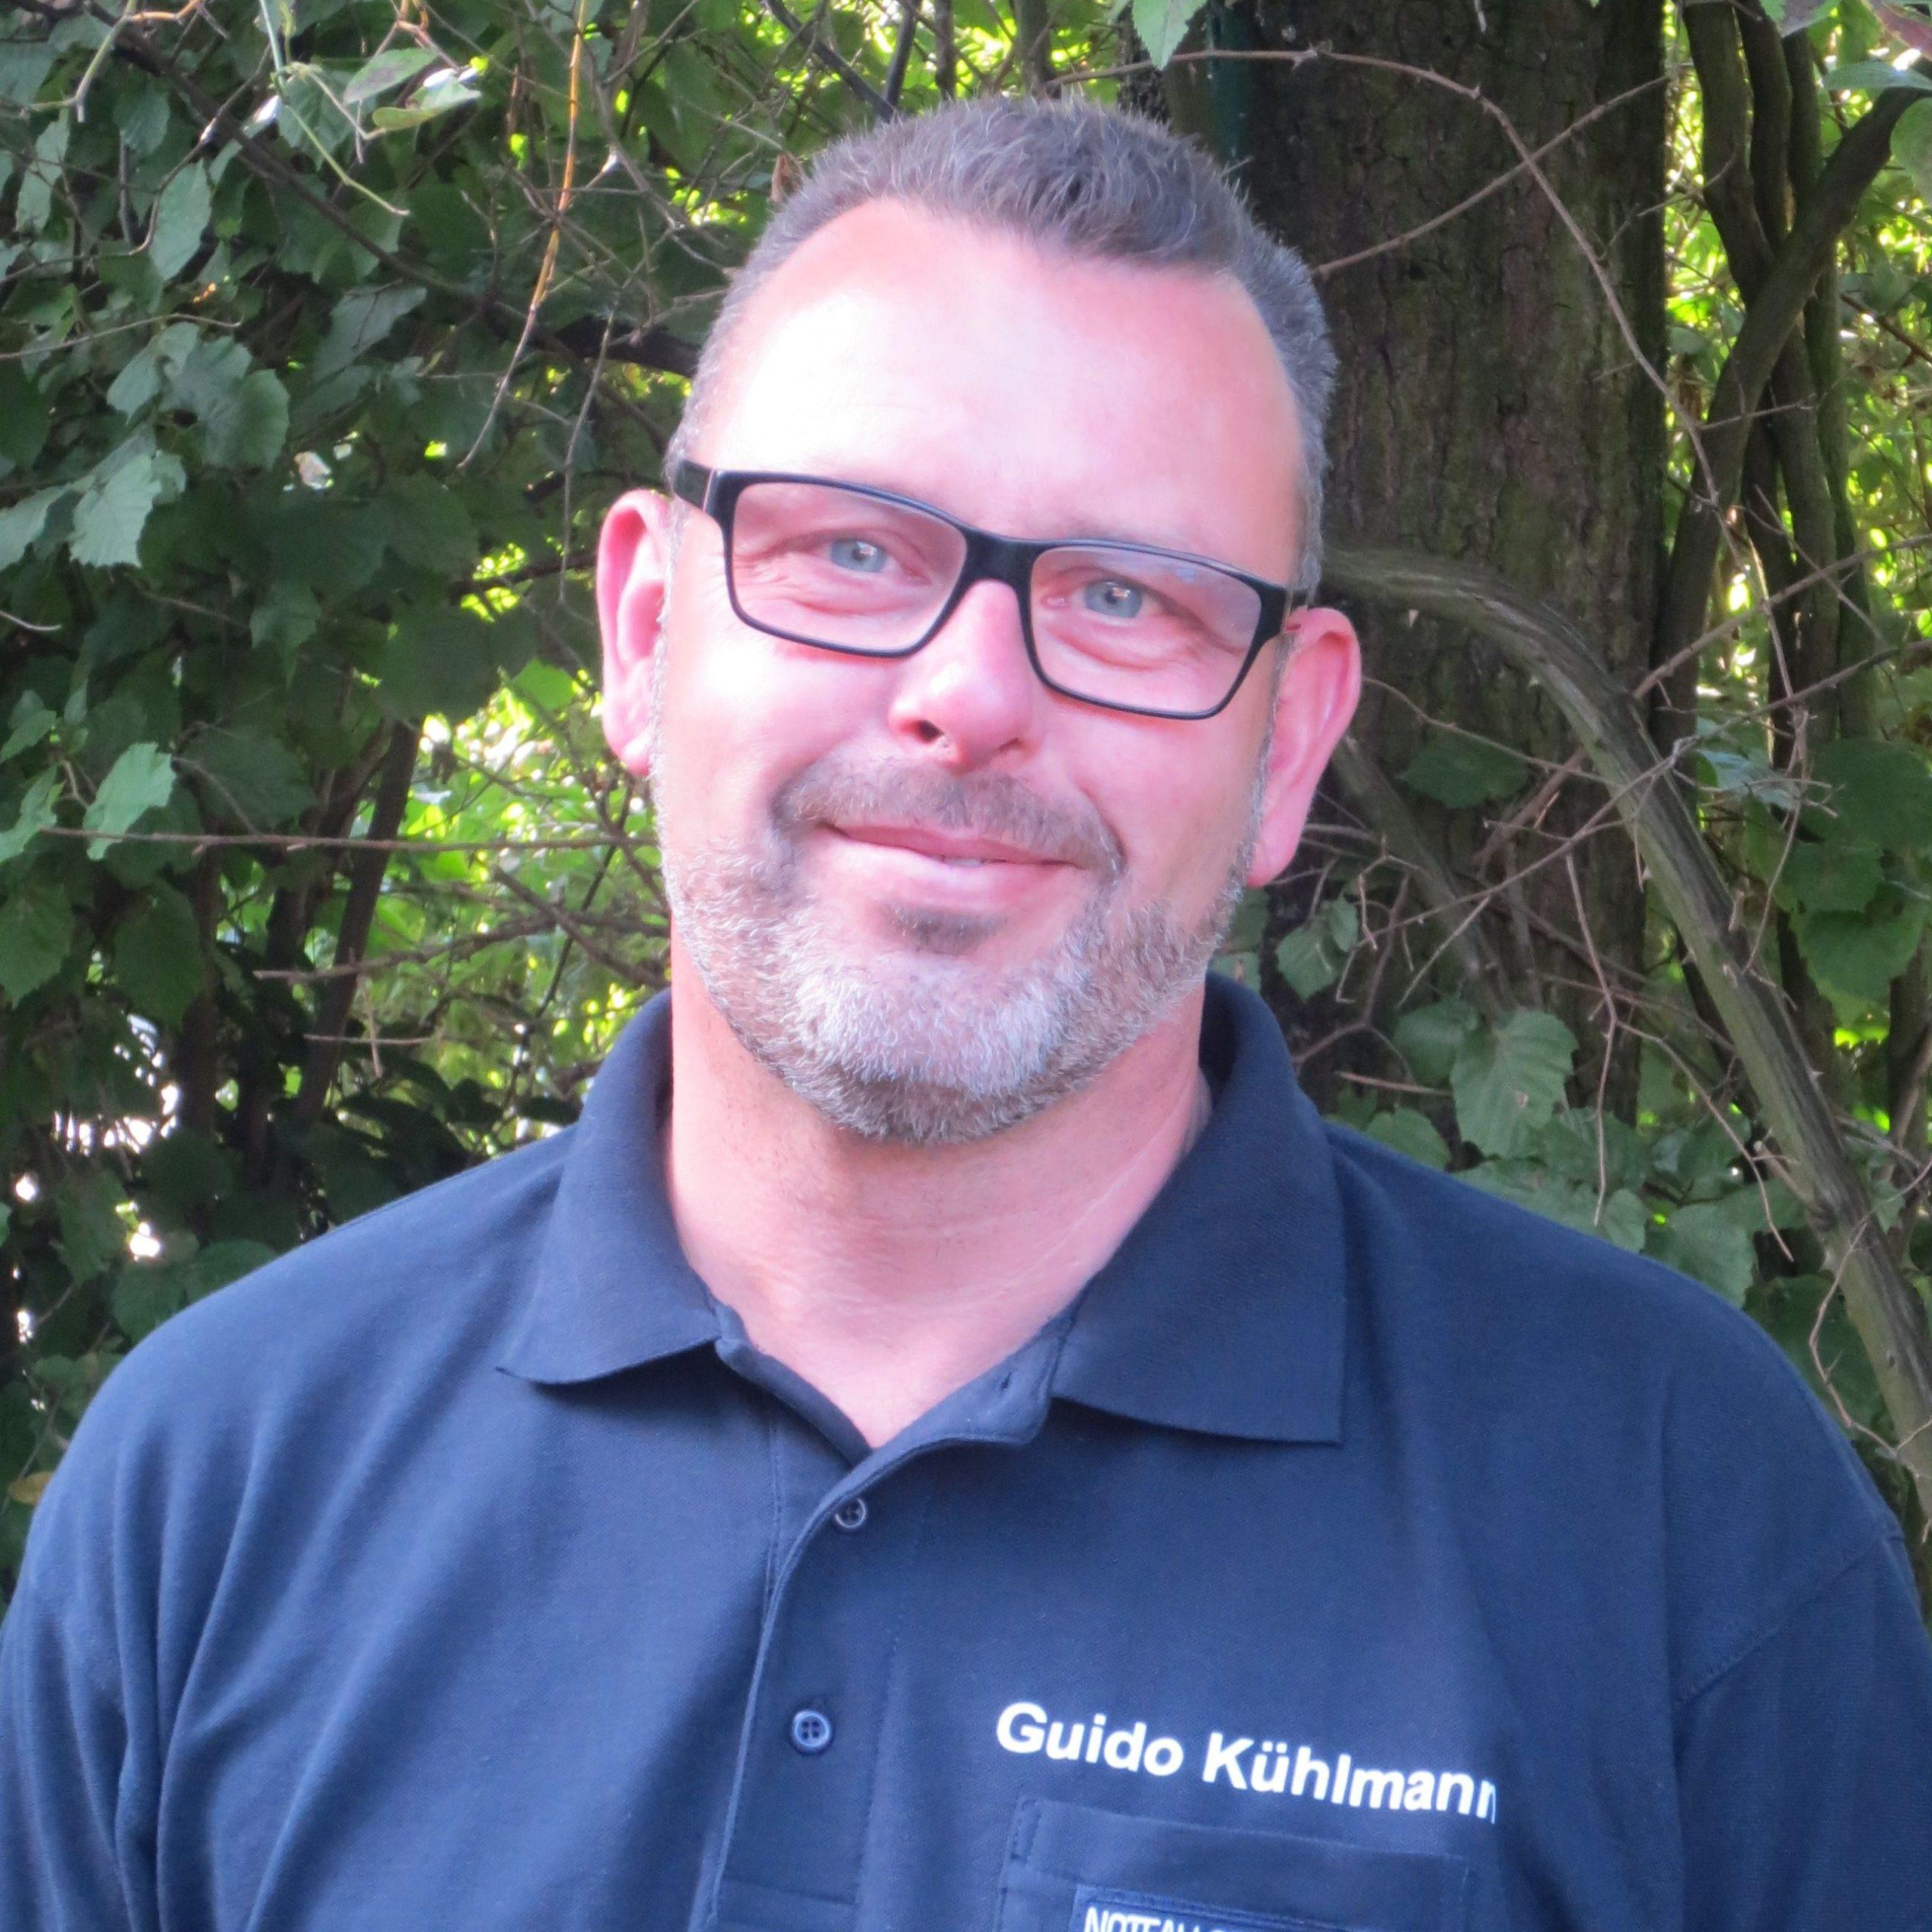 Guido Kühlmann